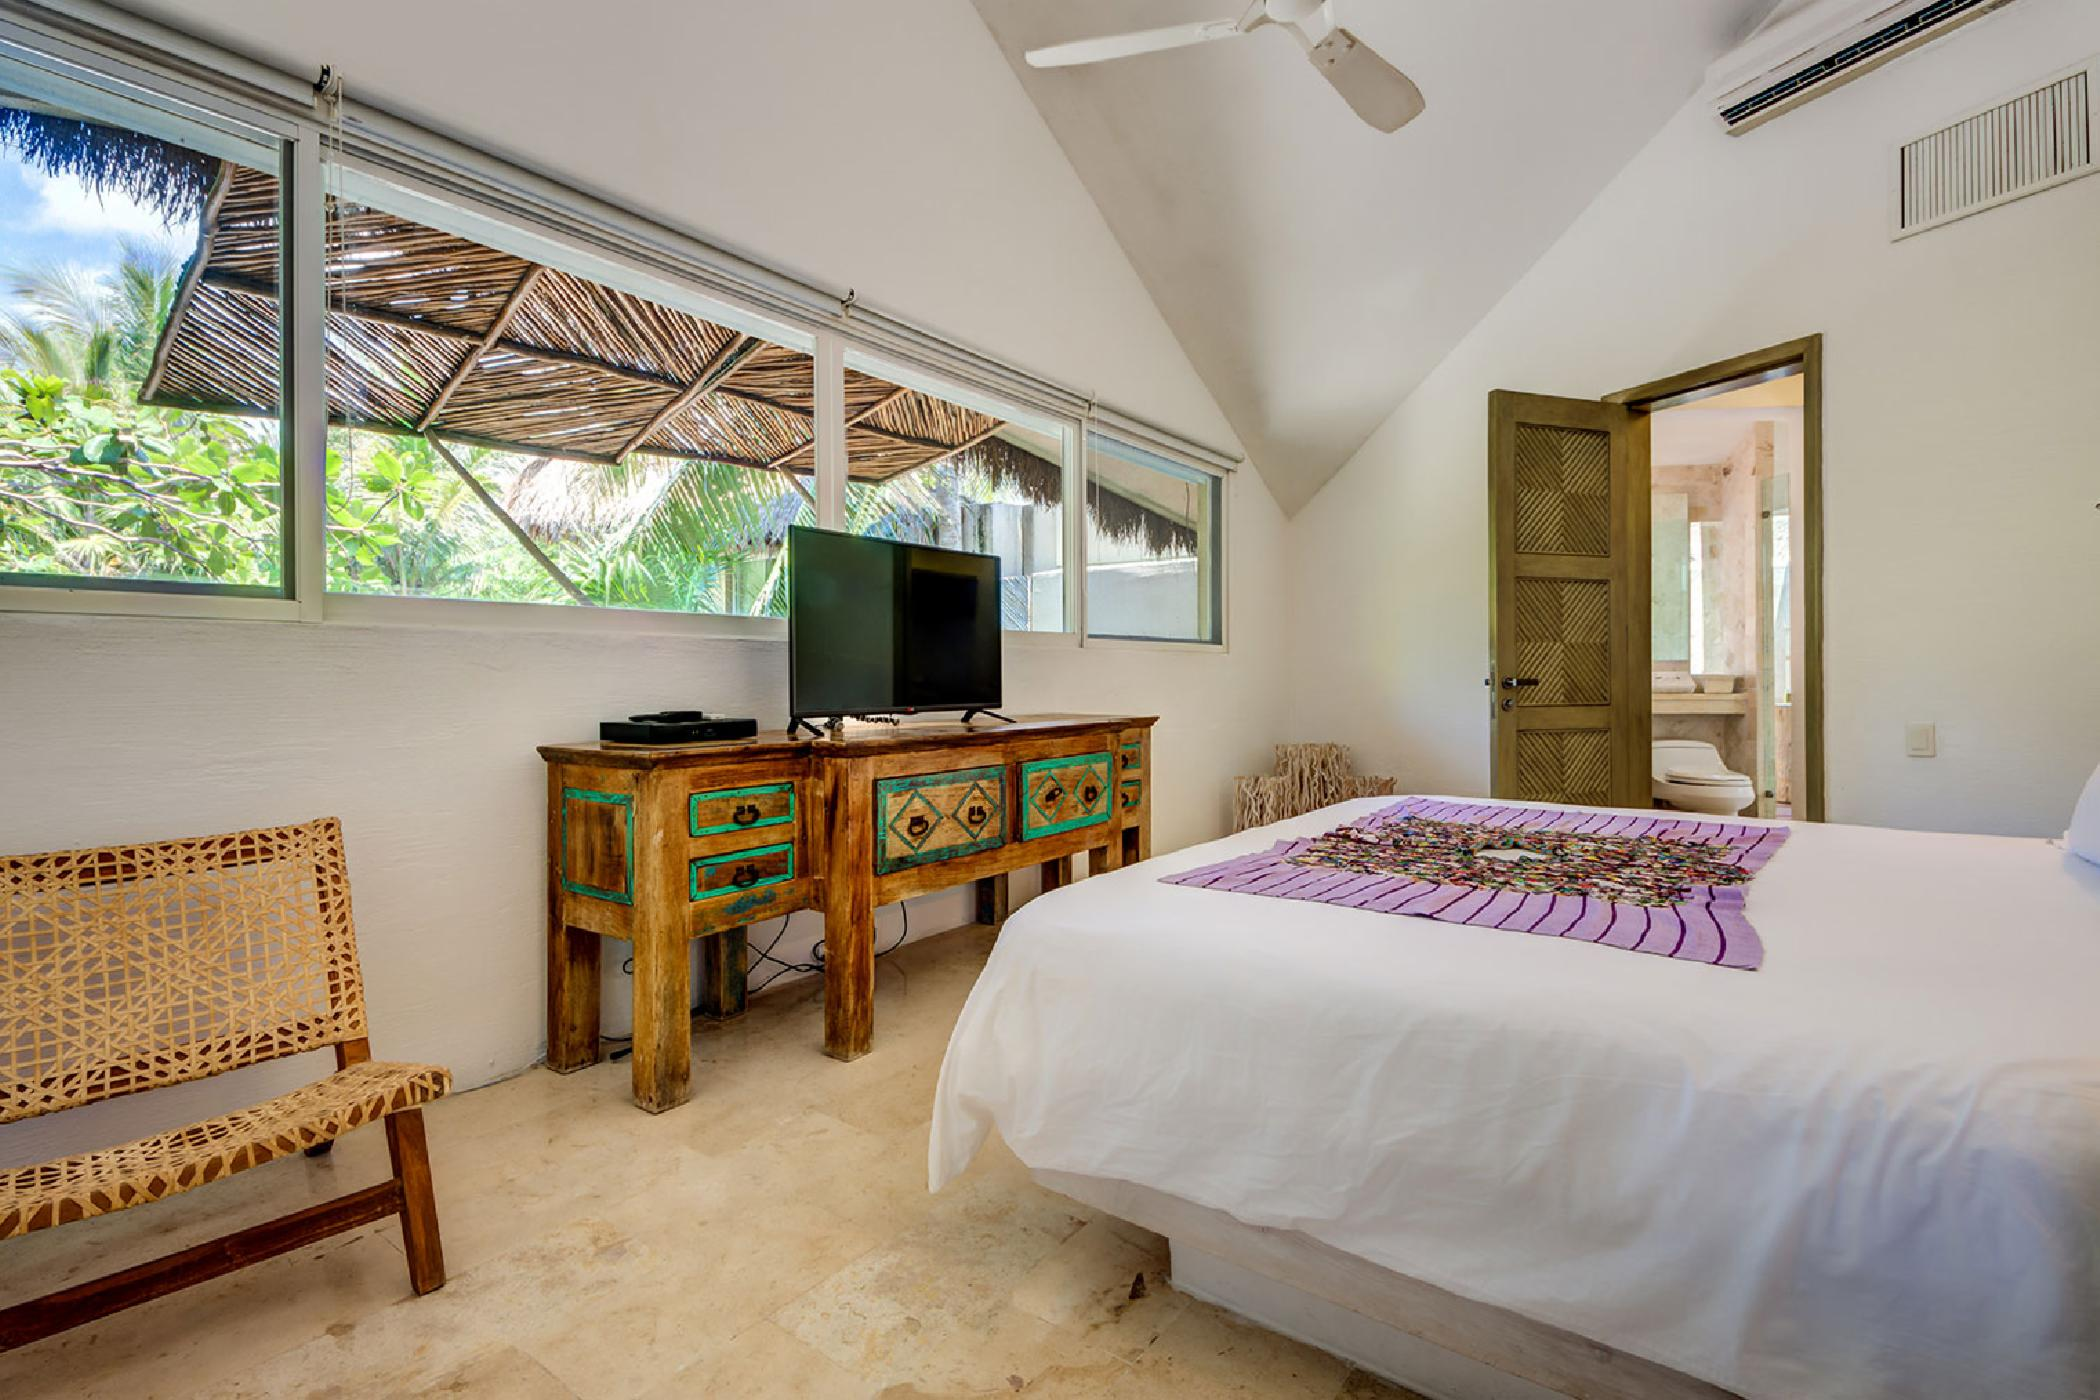 Maya_Luxe_Riviera_Maya_Luxury_Villas_Experiences_Puerto_Aventuras_5_Bedrooms_Zacil_Na_27.jpg